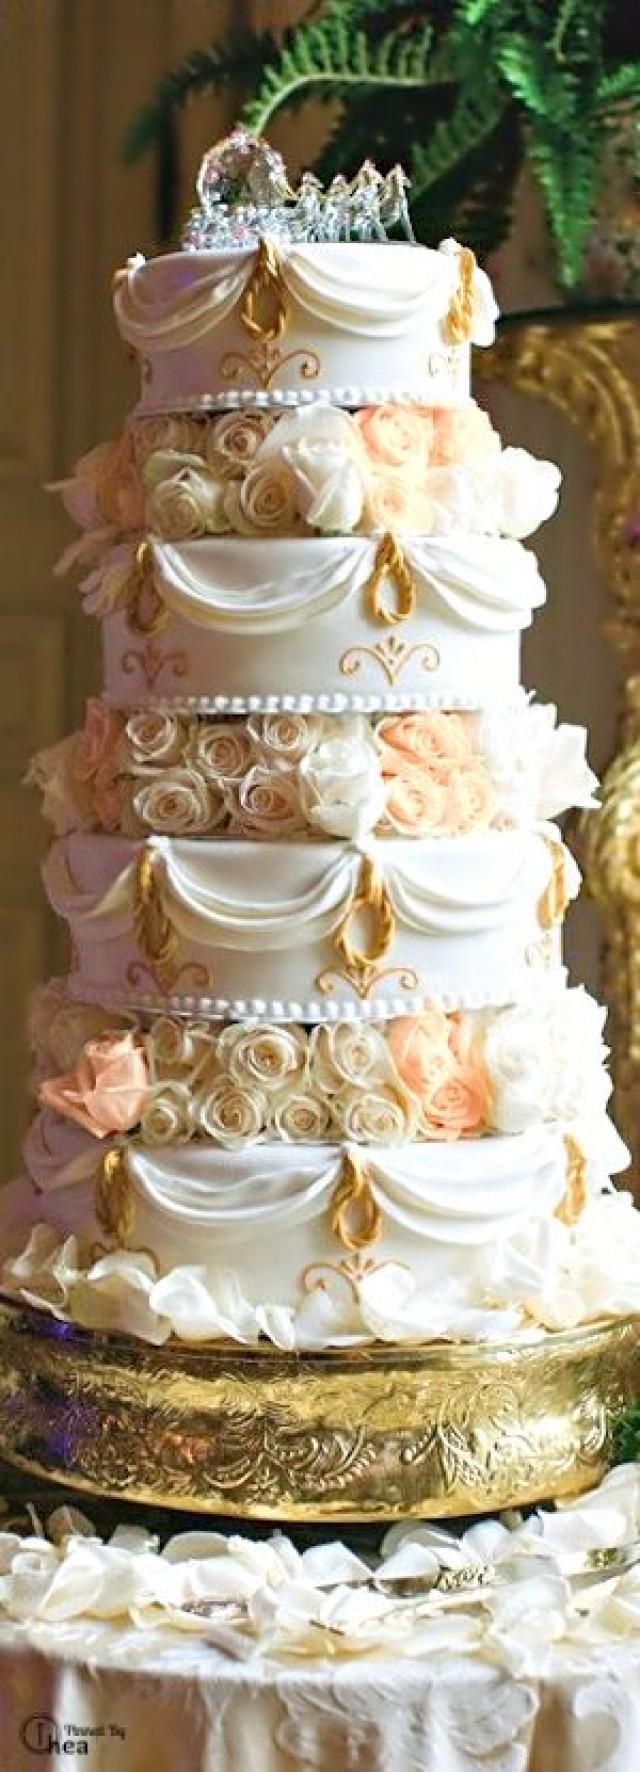 wedding photo - Dreamy Wedding Cakes